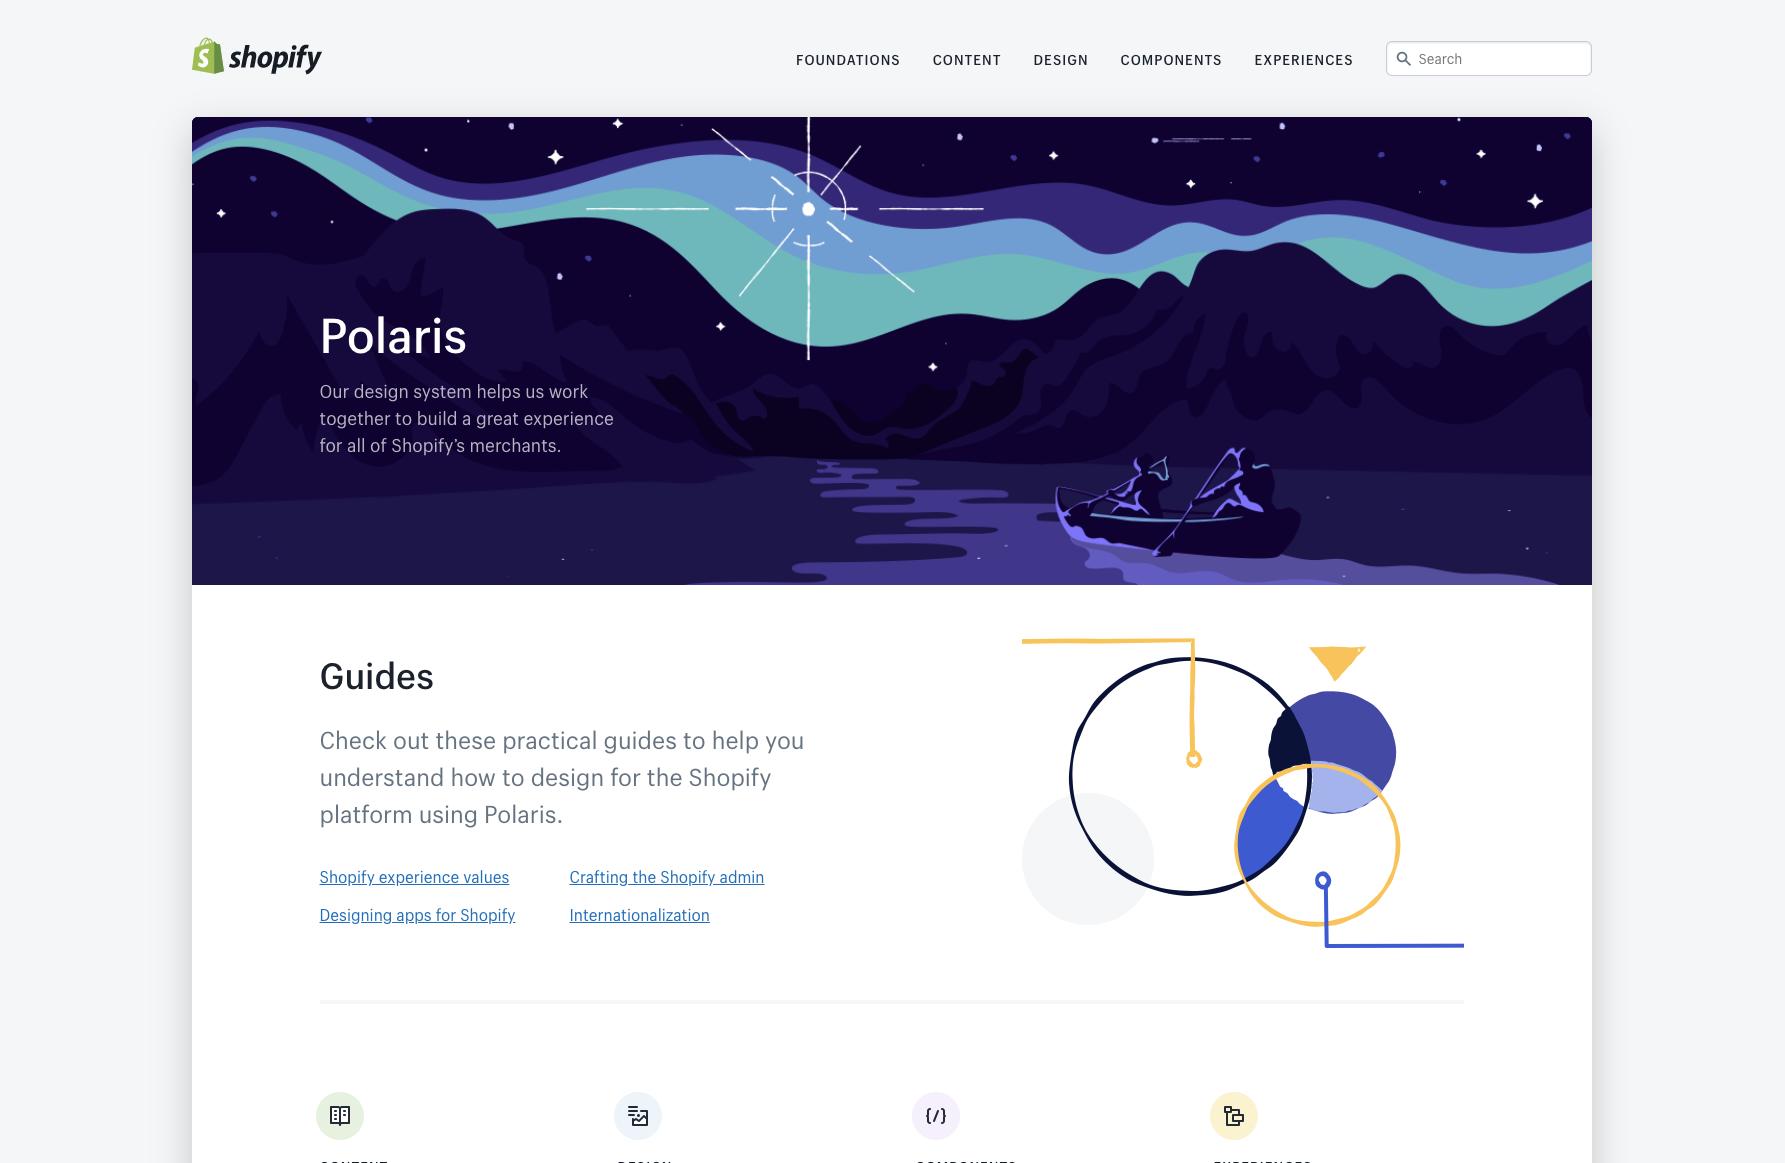 Polaris Shopify's Design System Homepage